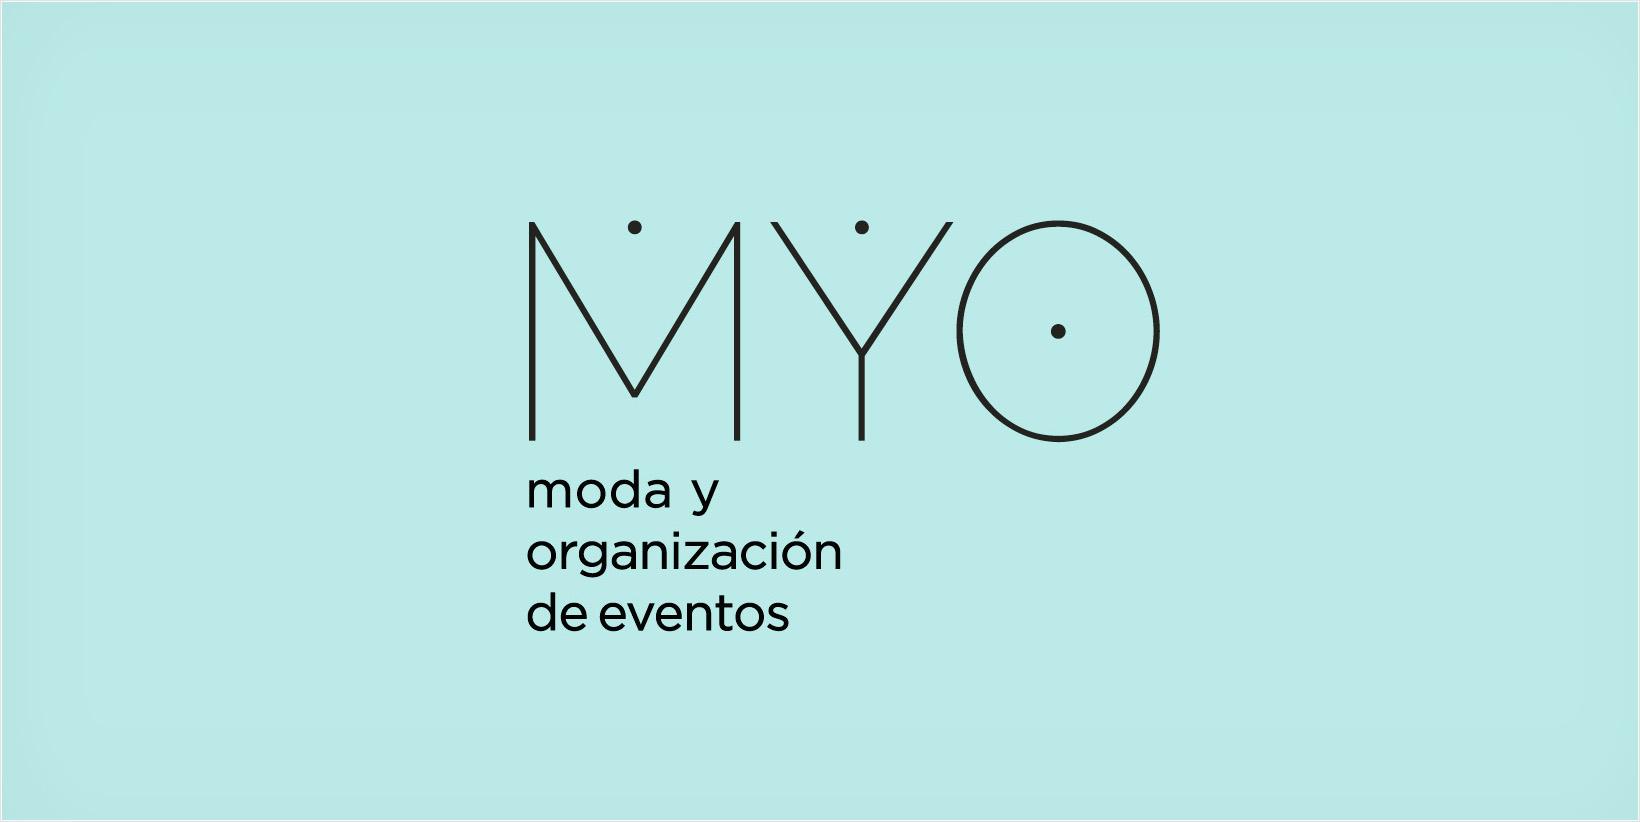 6569130833myo_logo